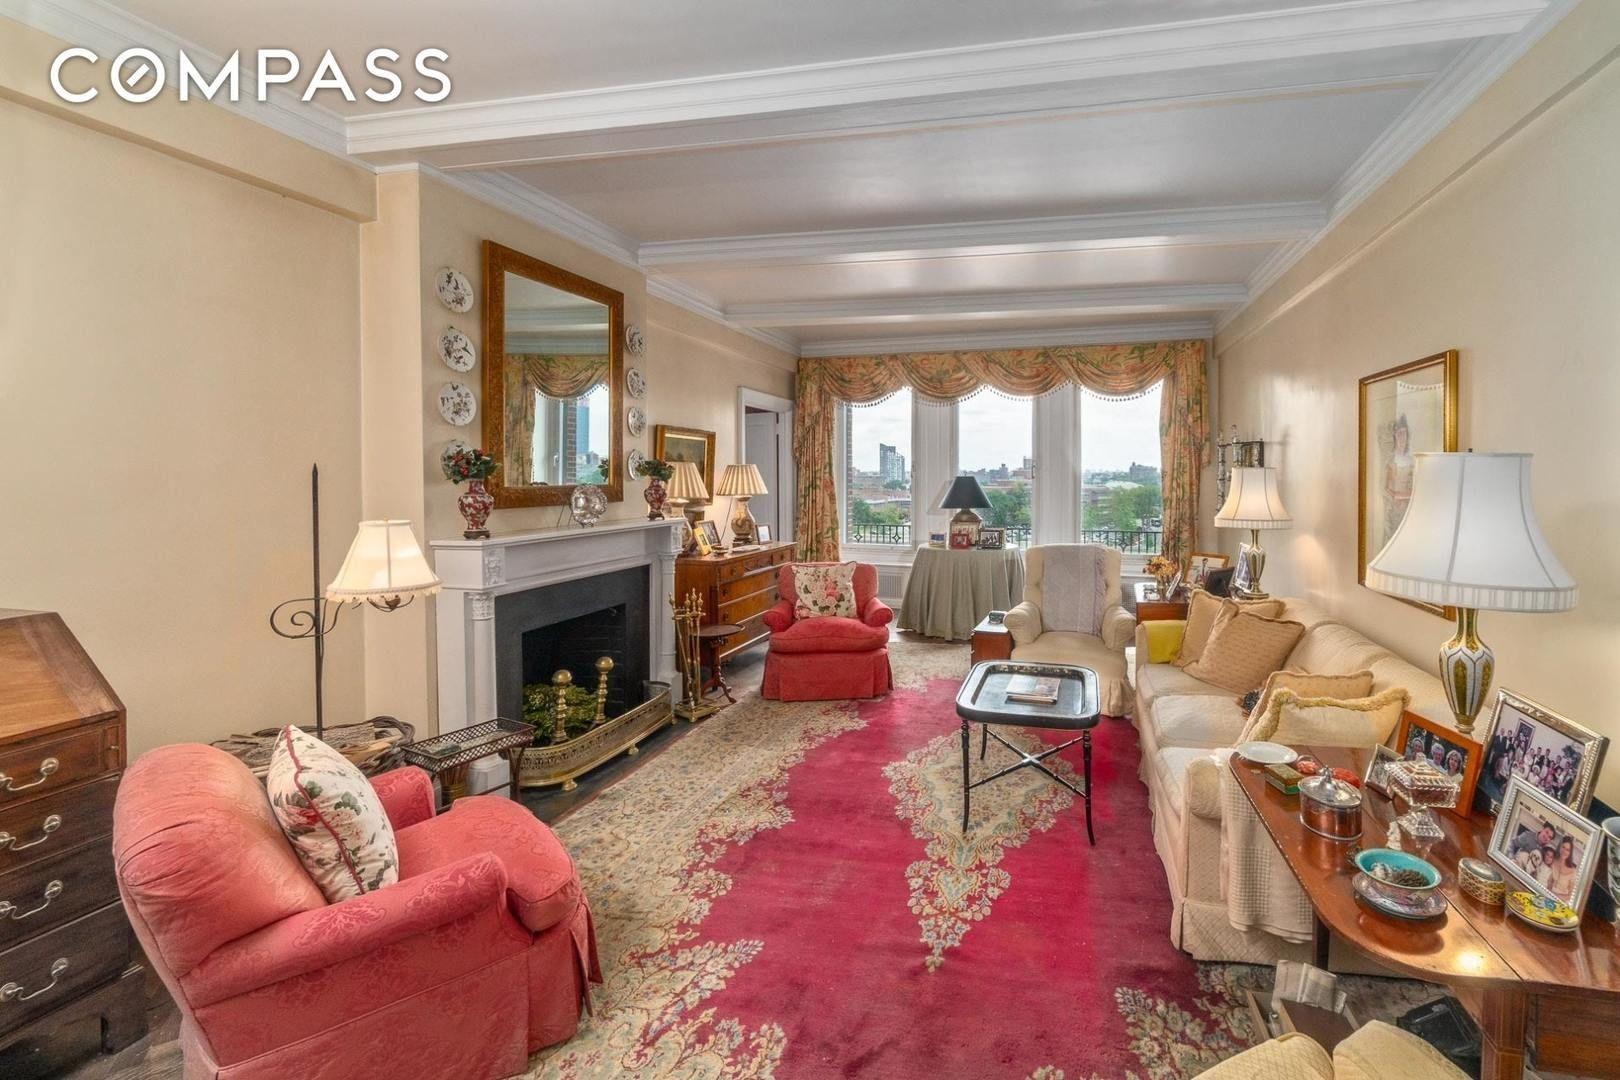 Apartment for sale at 25 East End Avenue, Apt 8-E